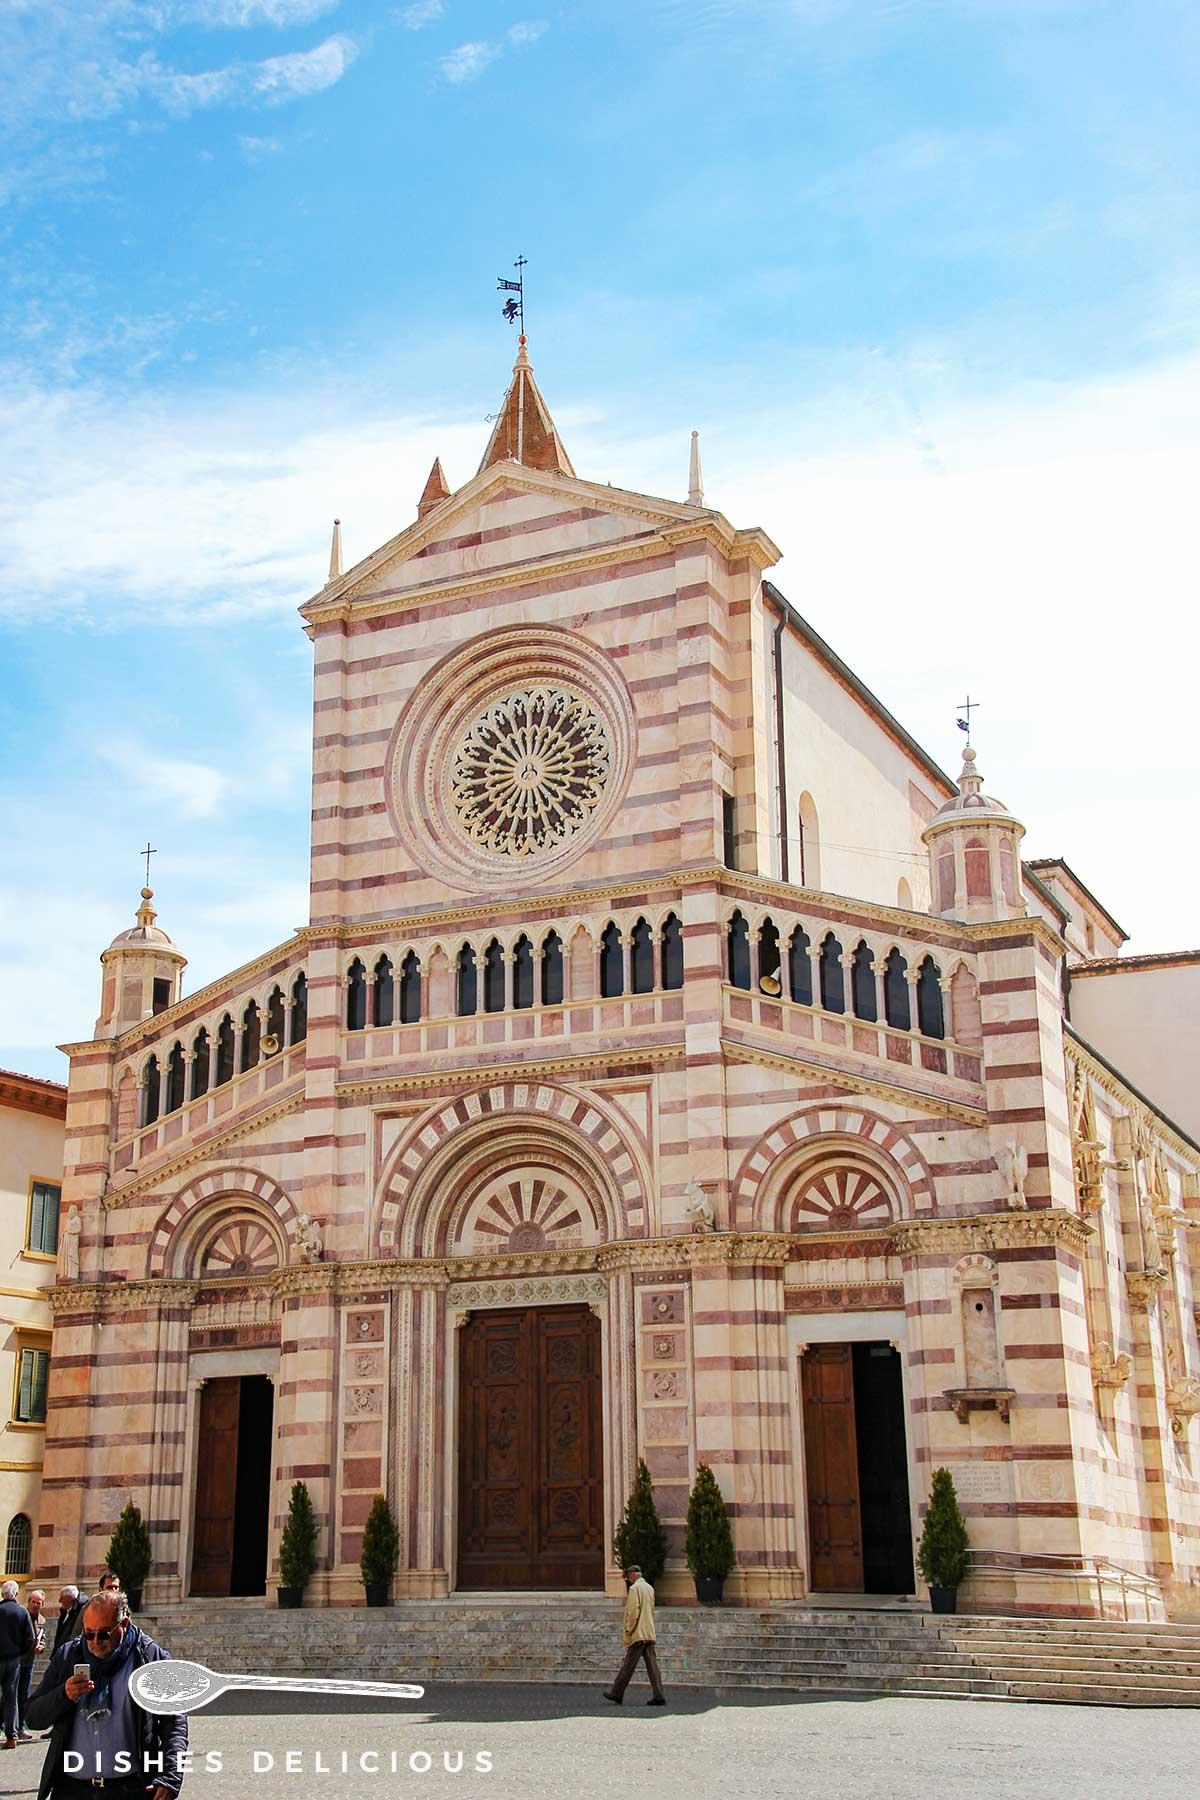 Foto vom Dom San Lorenzo in Grosseto.